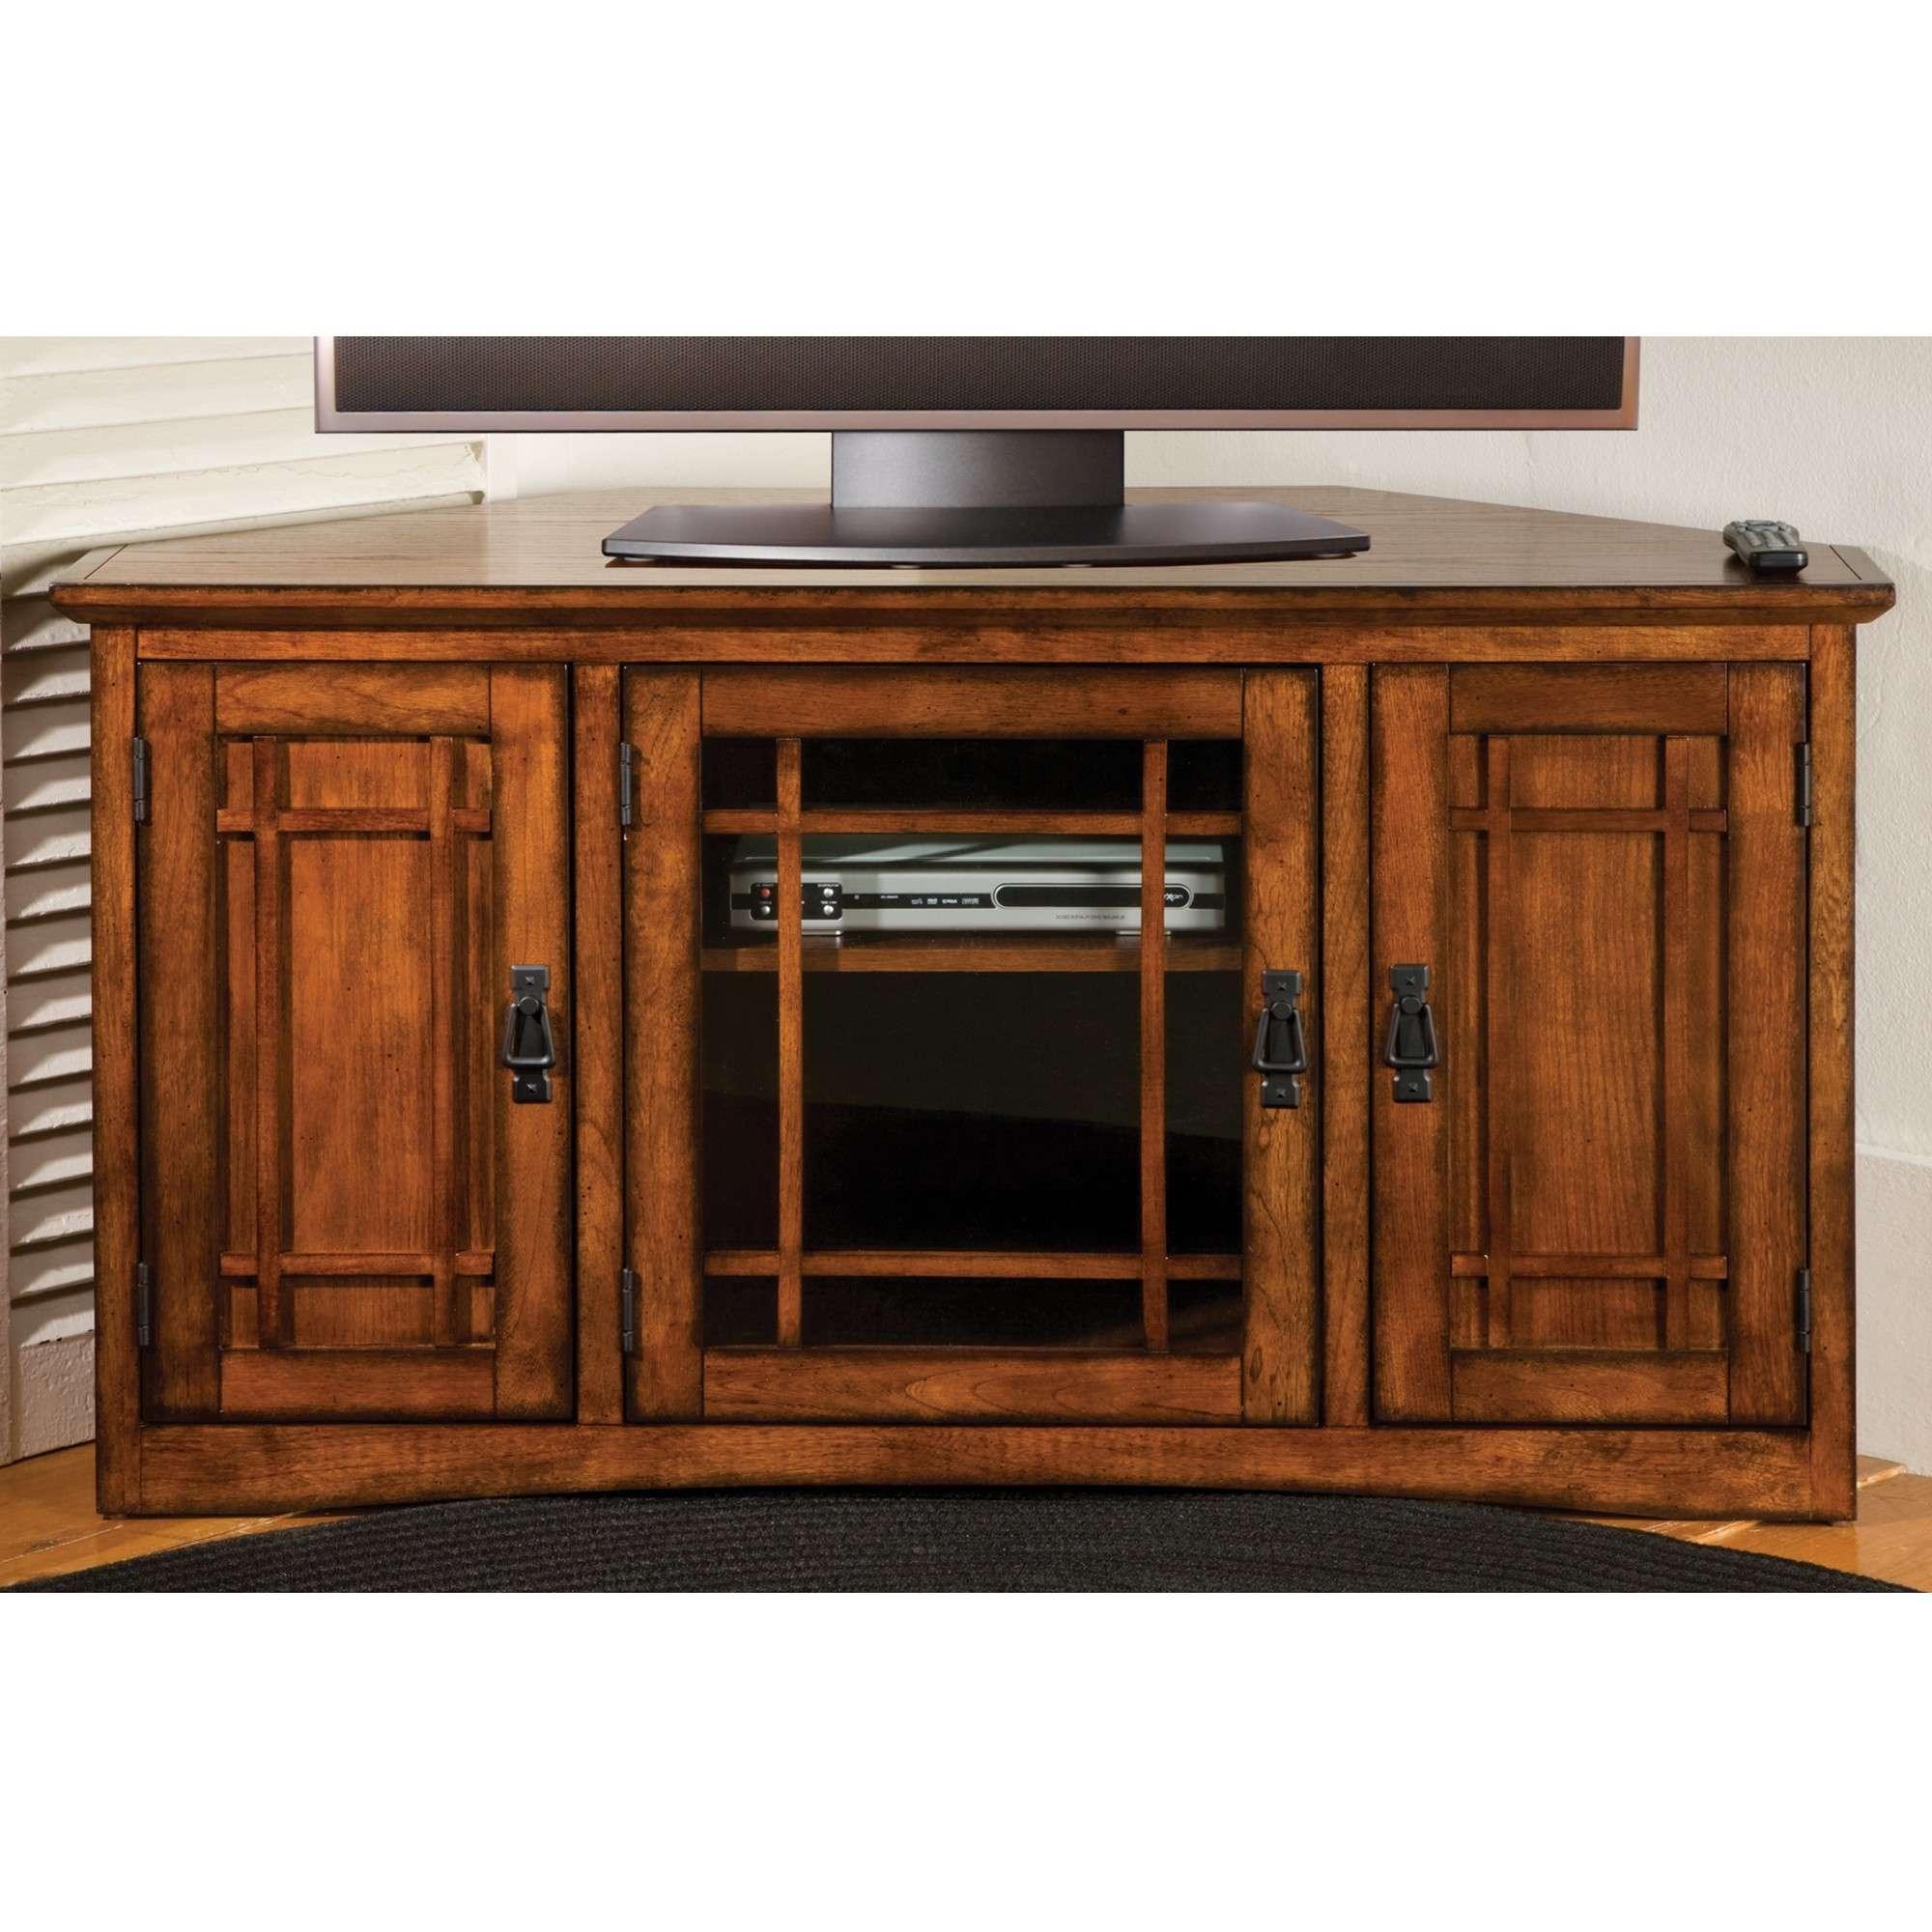 Mission Corner Tv Cabinet | Sturbridge Yankee Workshop Regarding Corner Tv Cabinets For Flat Screens With Doors (View 13 of 20)